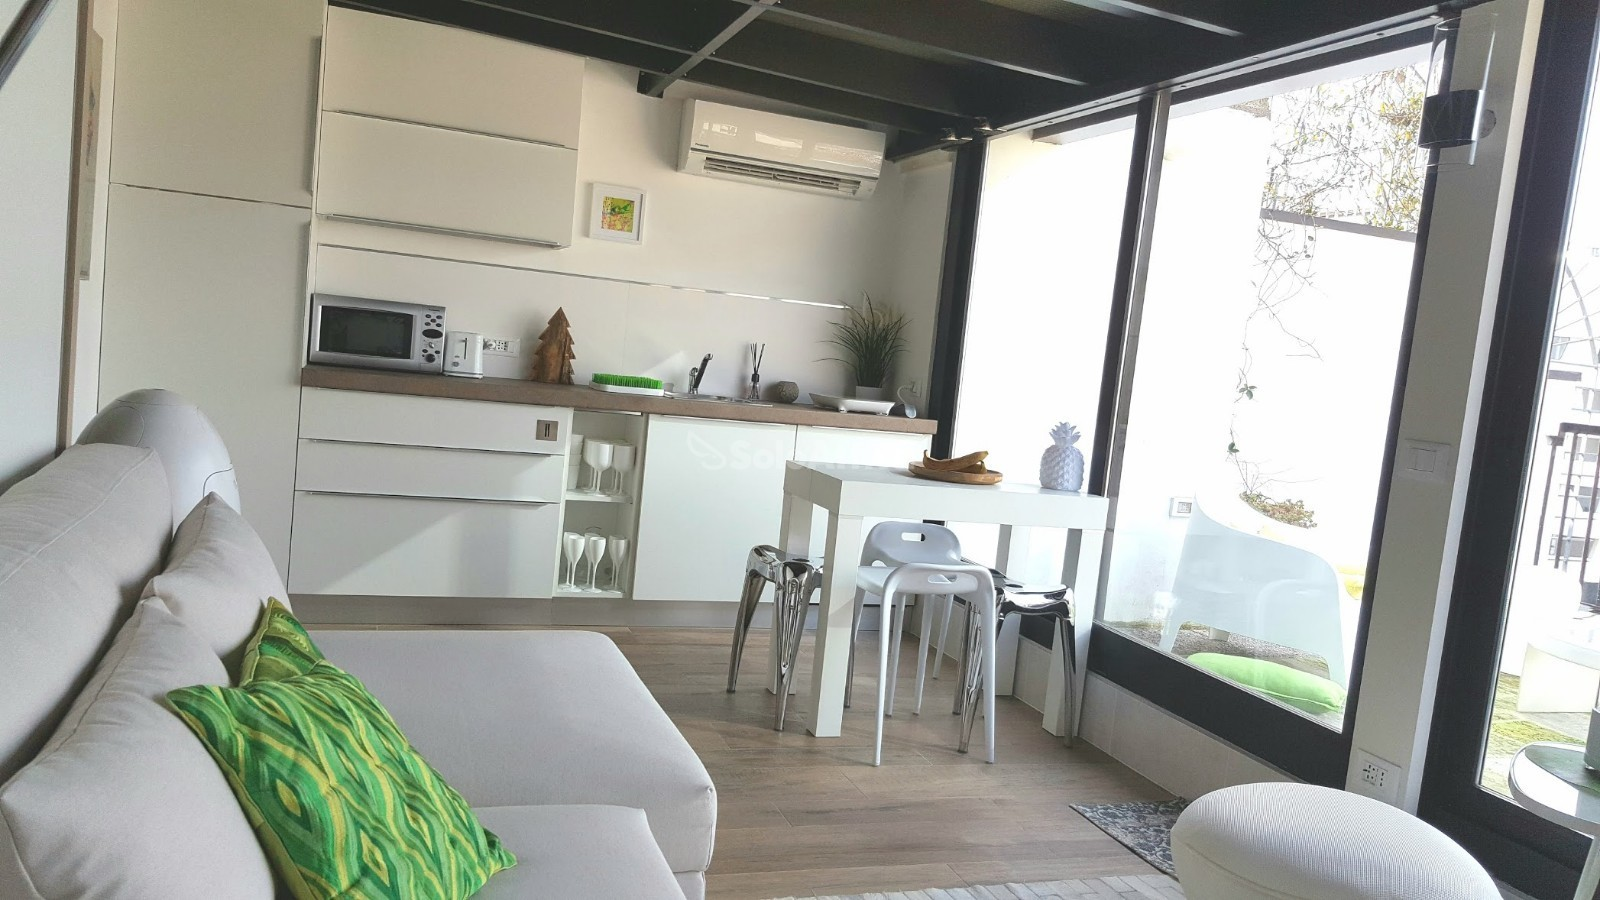 affitto appartamento mansarda arredato 30 mq.